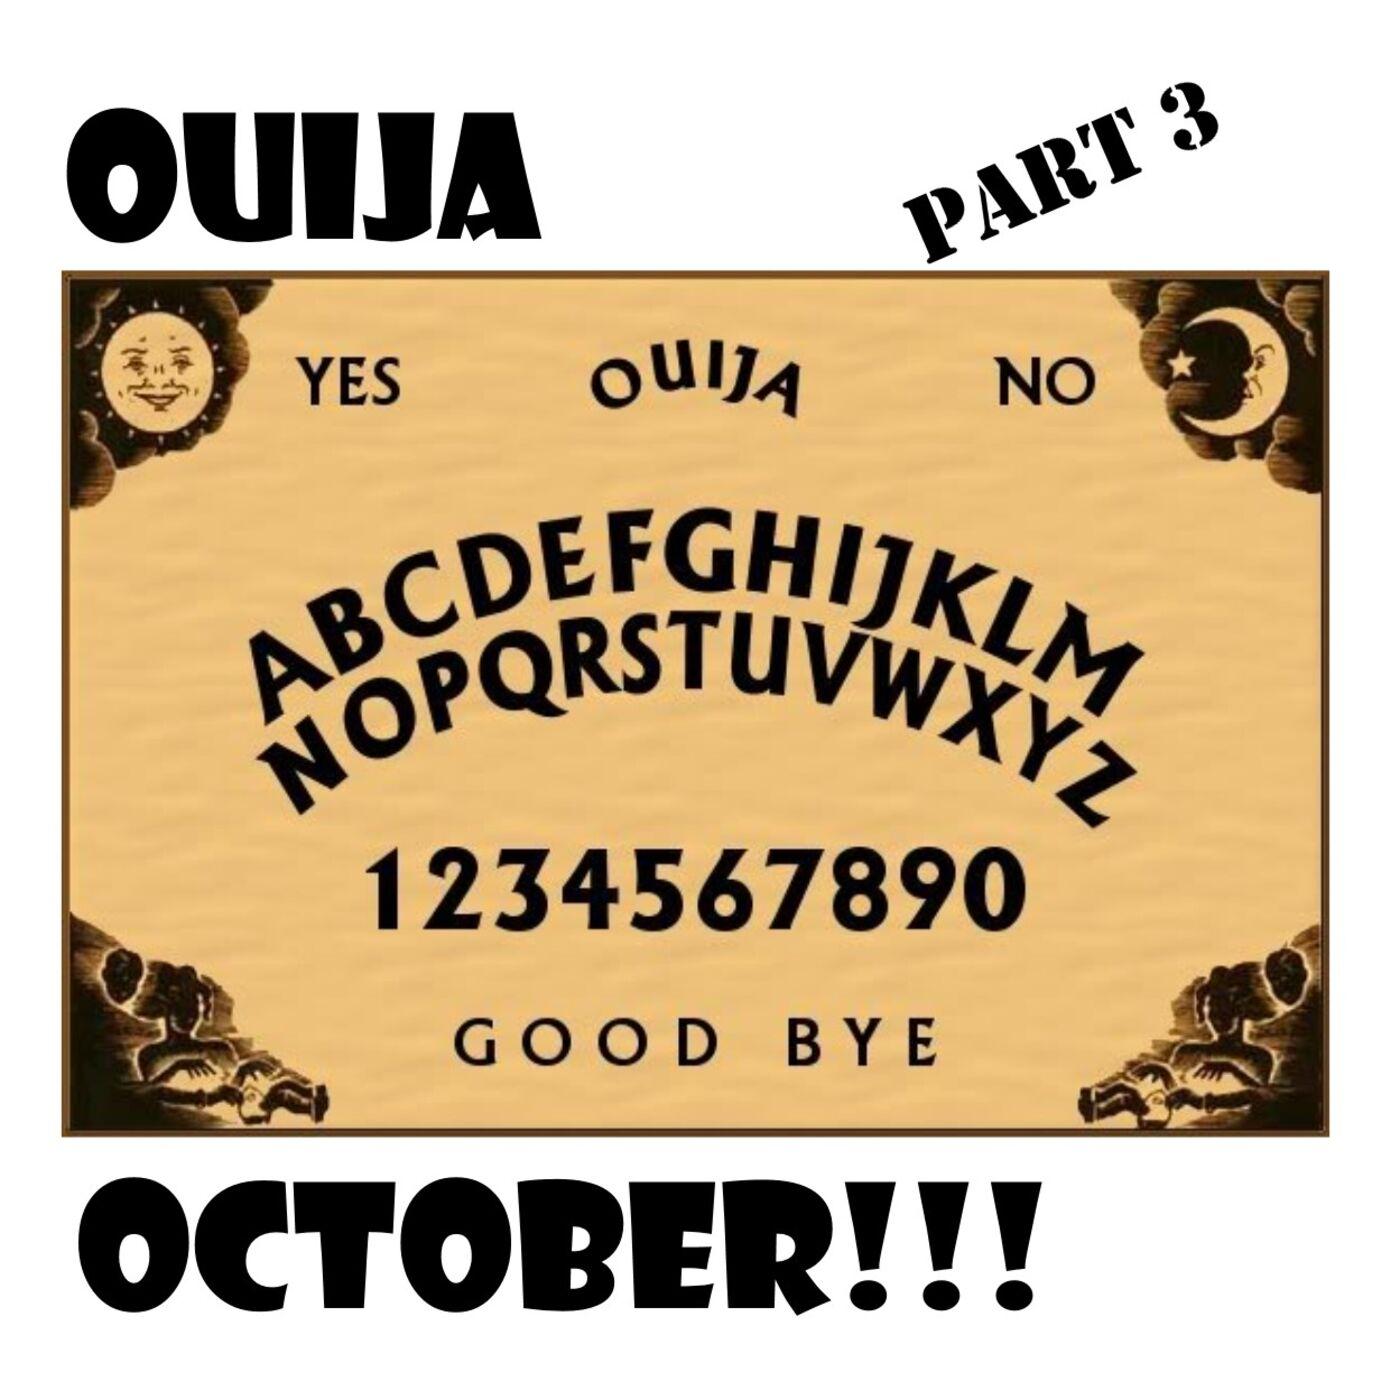 S1 E36 Ouija October!!! - Part 3 - Baal Kadmon is in the House!!